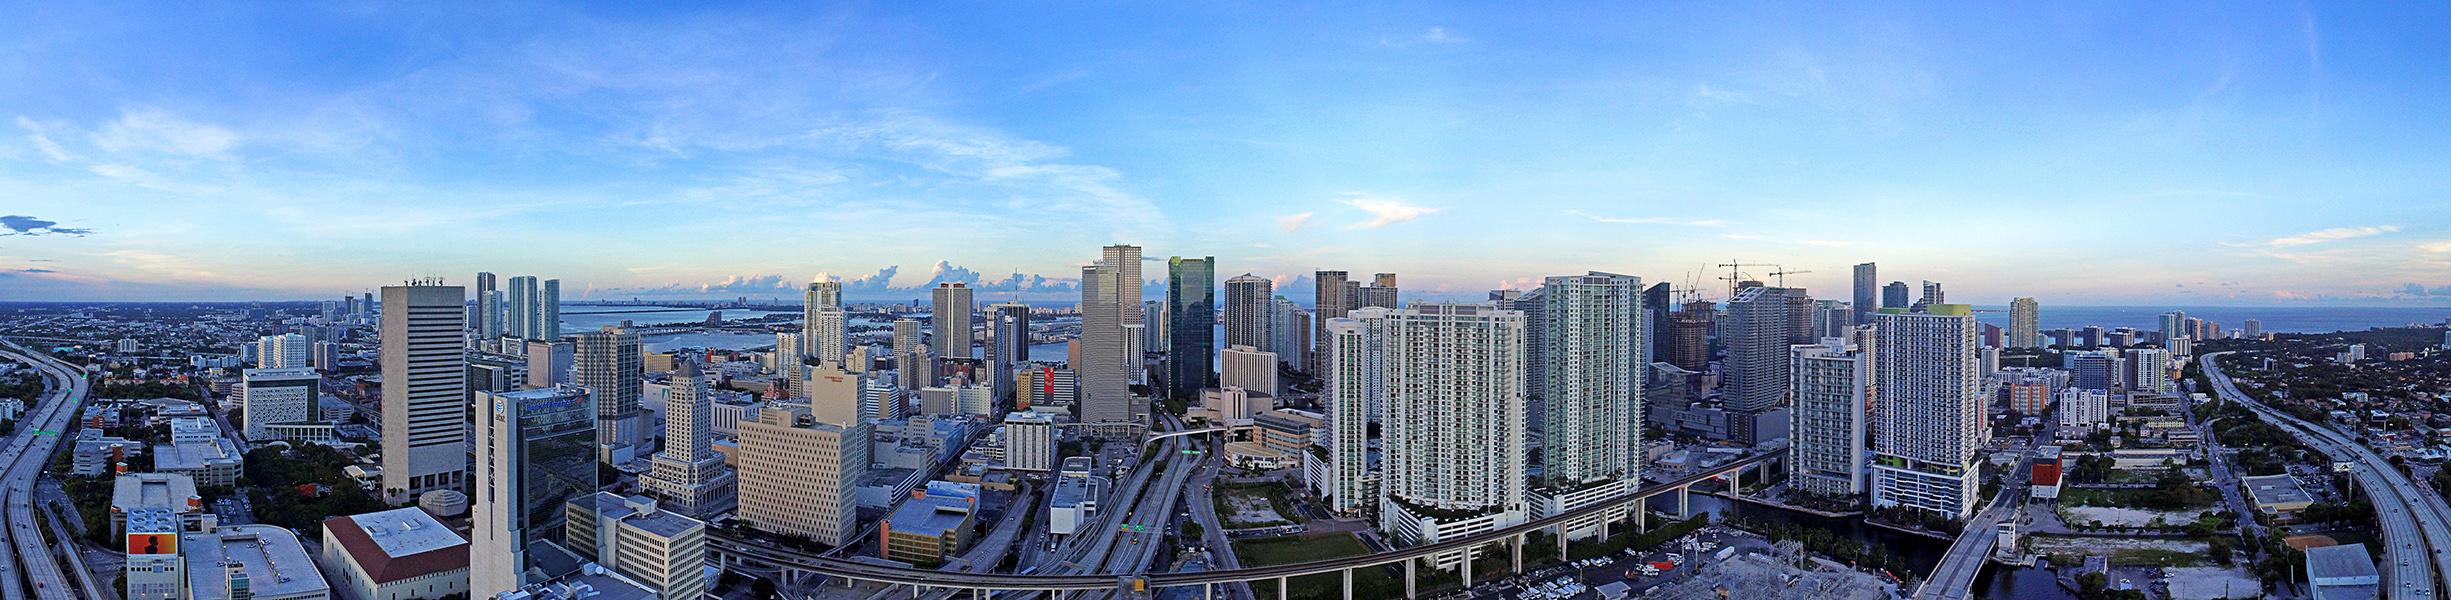 Downtown Miami Panoramic Image via Azeez Bakare Studios